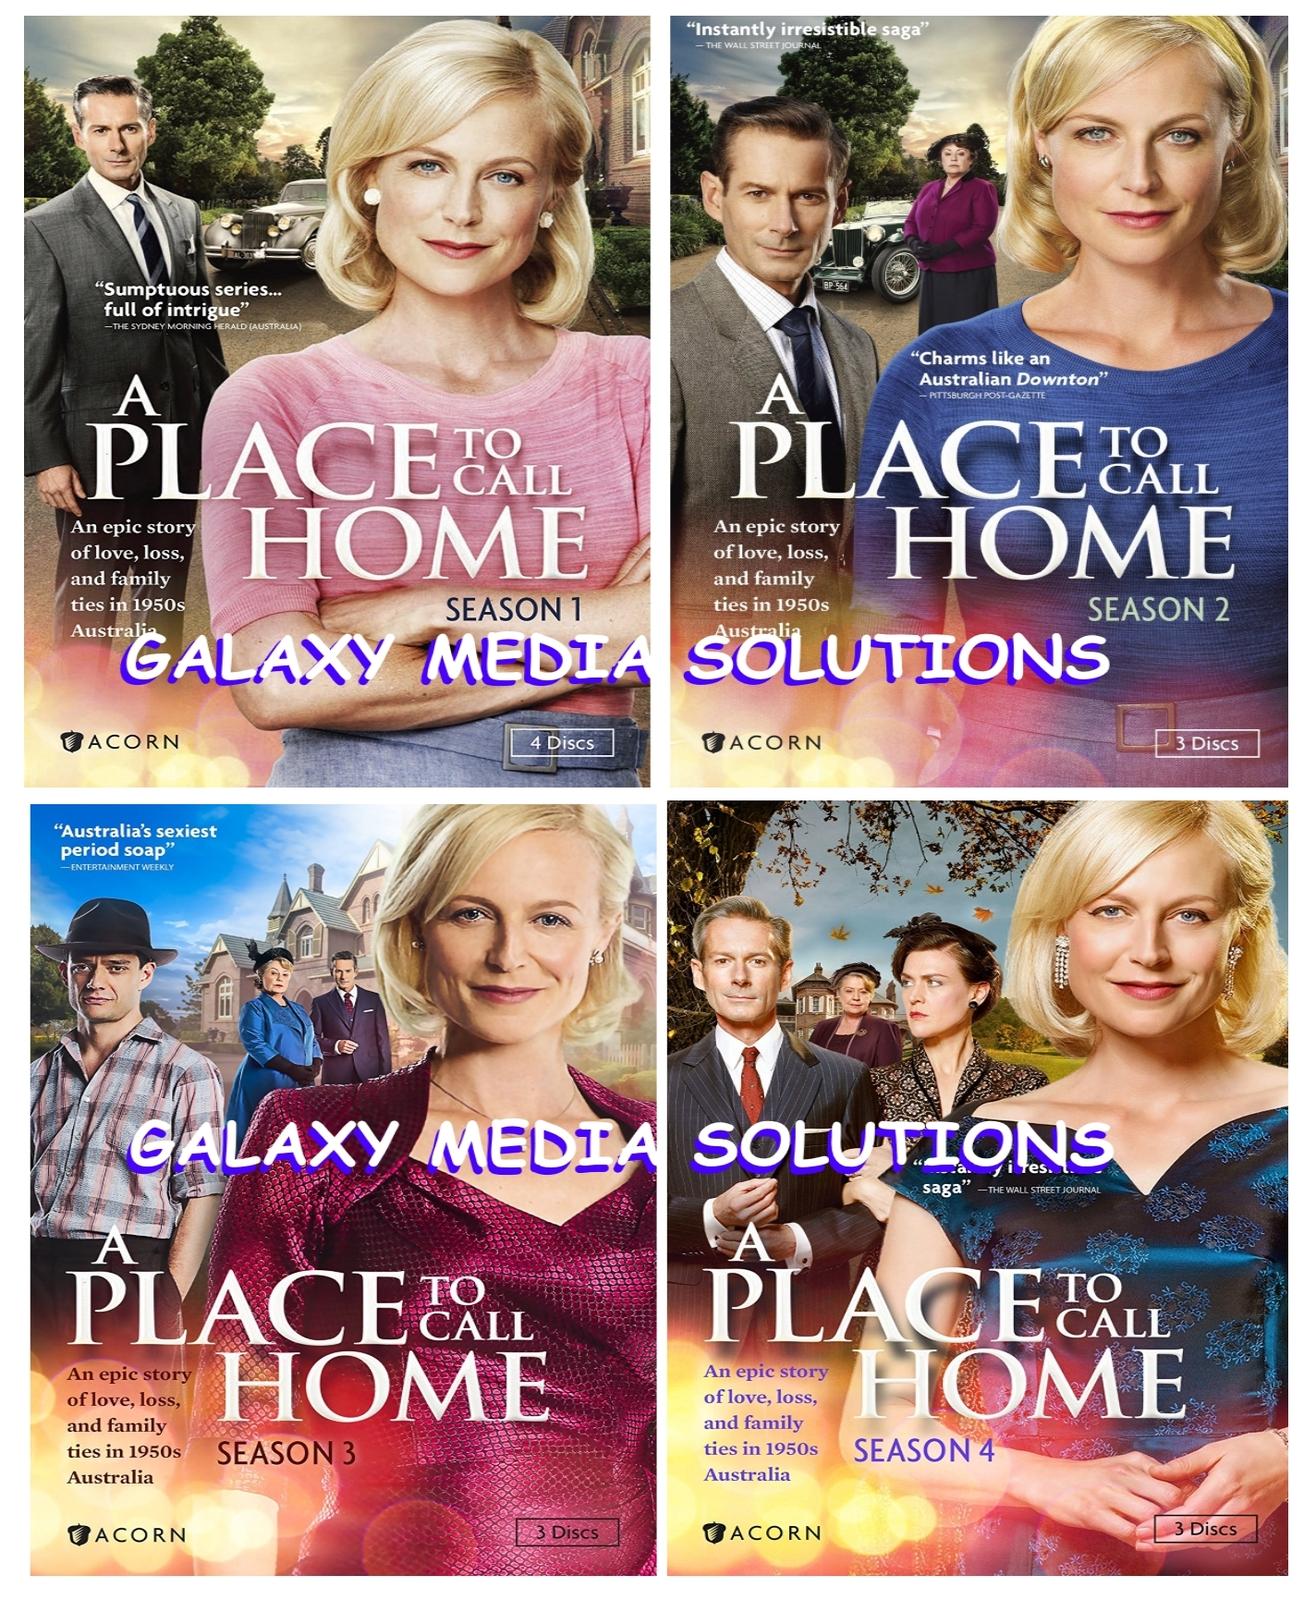 A place to call home season 1 4 dvd bundle  10 disc  1 2 3 4 5